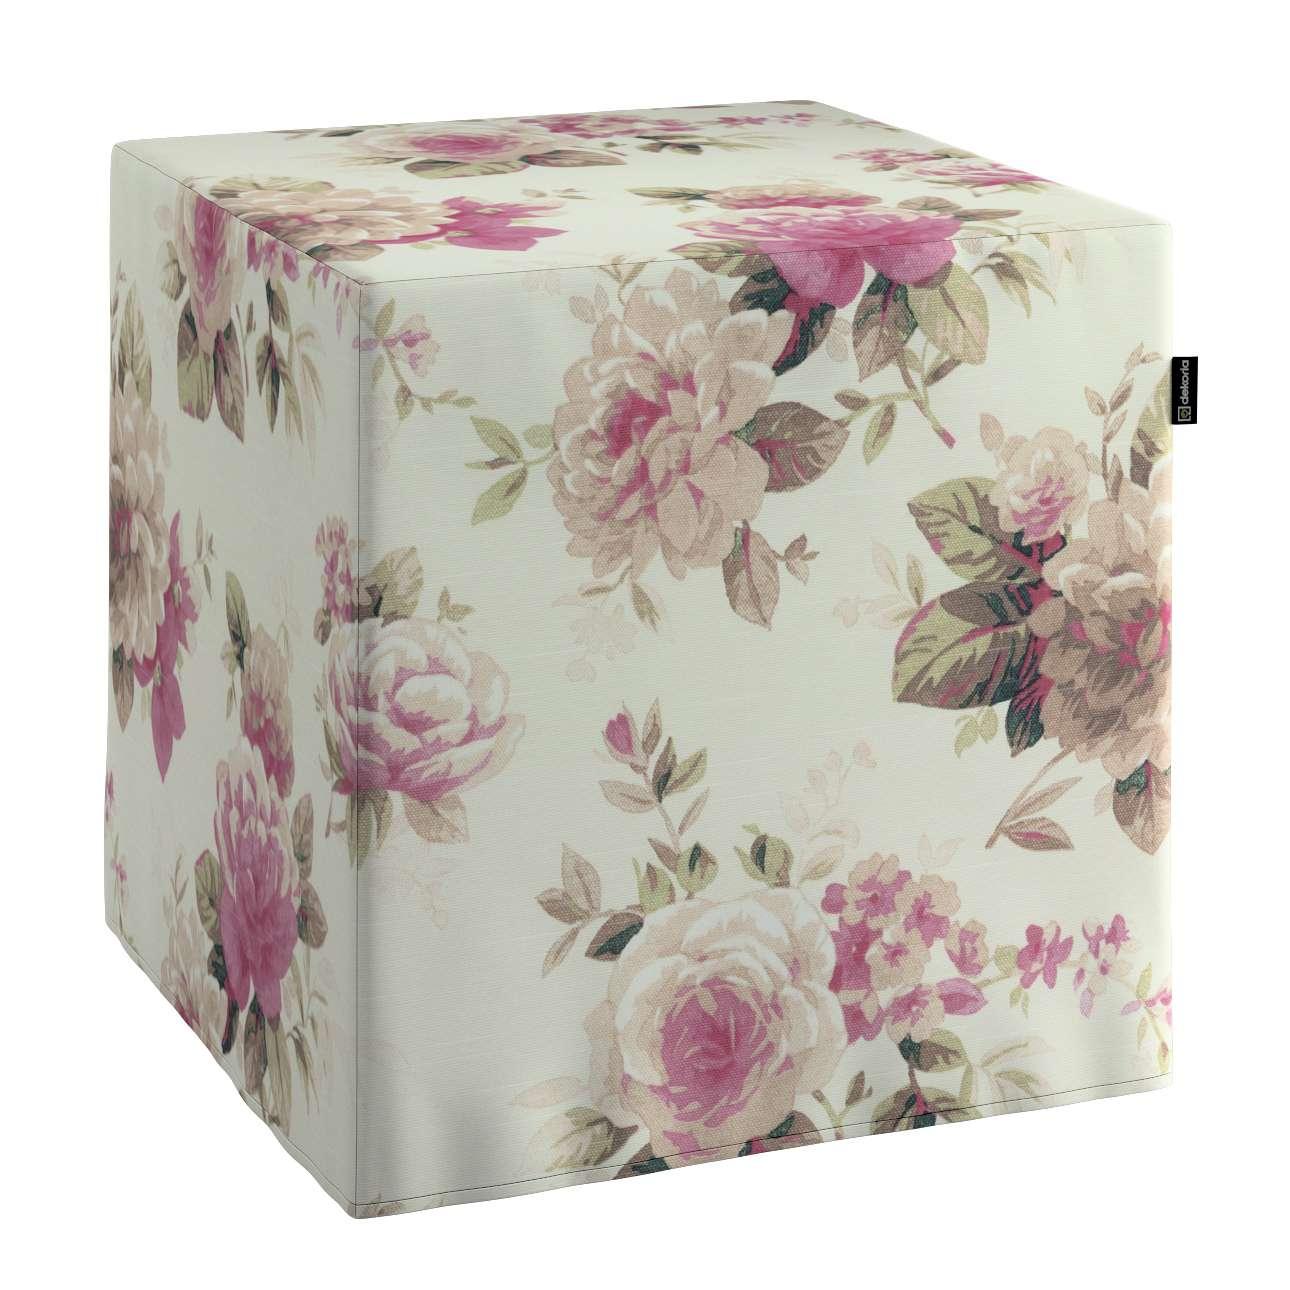 Cube 40 x 40 x 40 cm (16 x 16 x 16 inch) in collection Mirella, fabric: 141-07